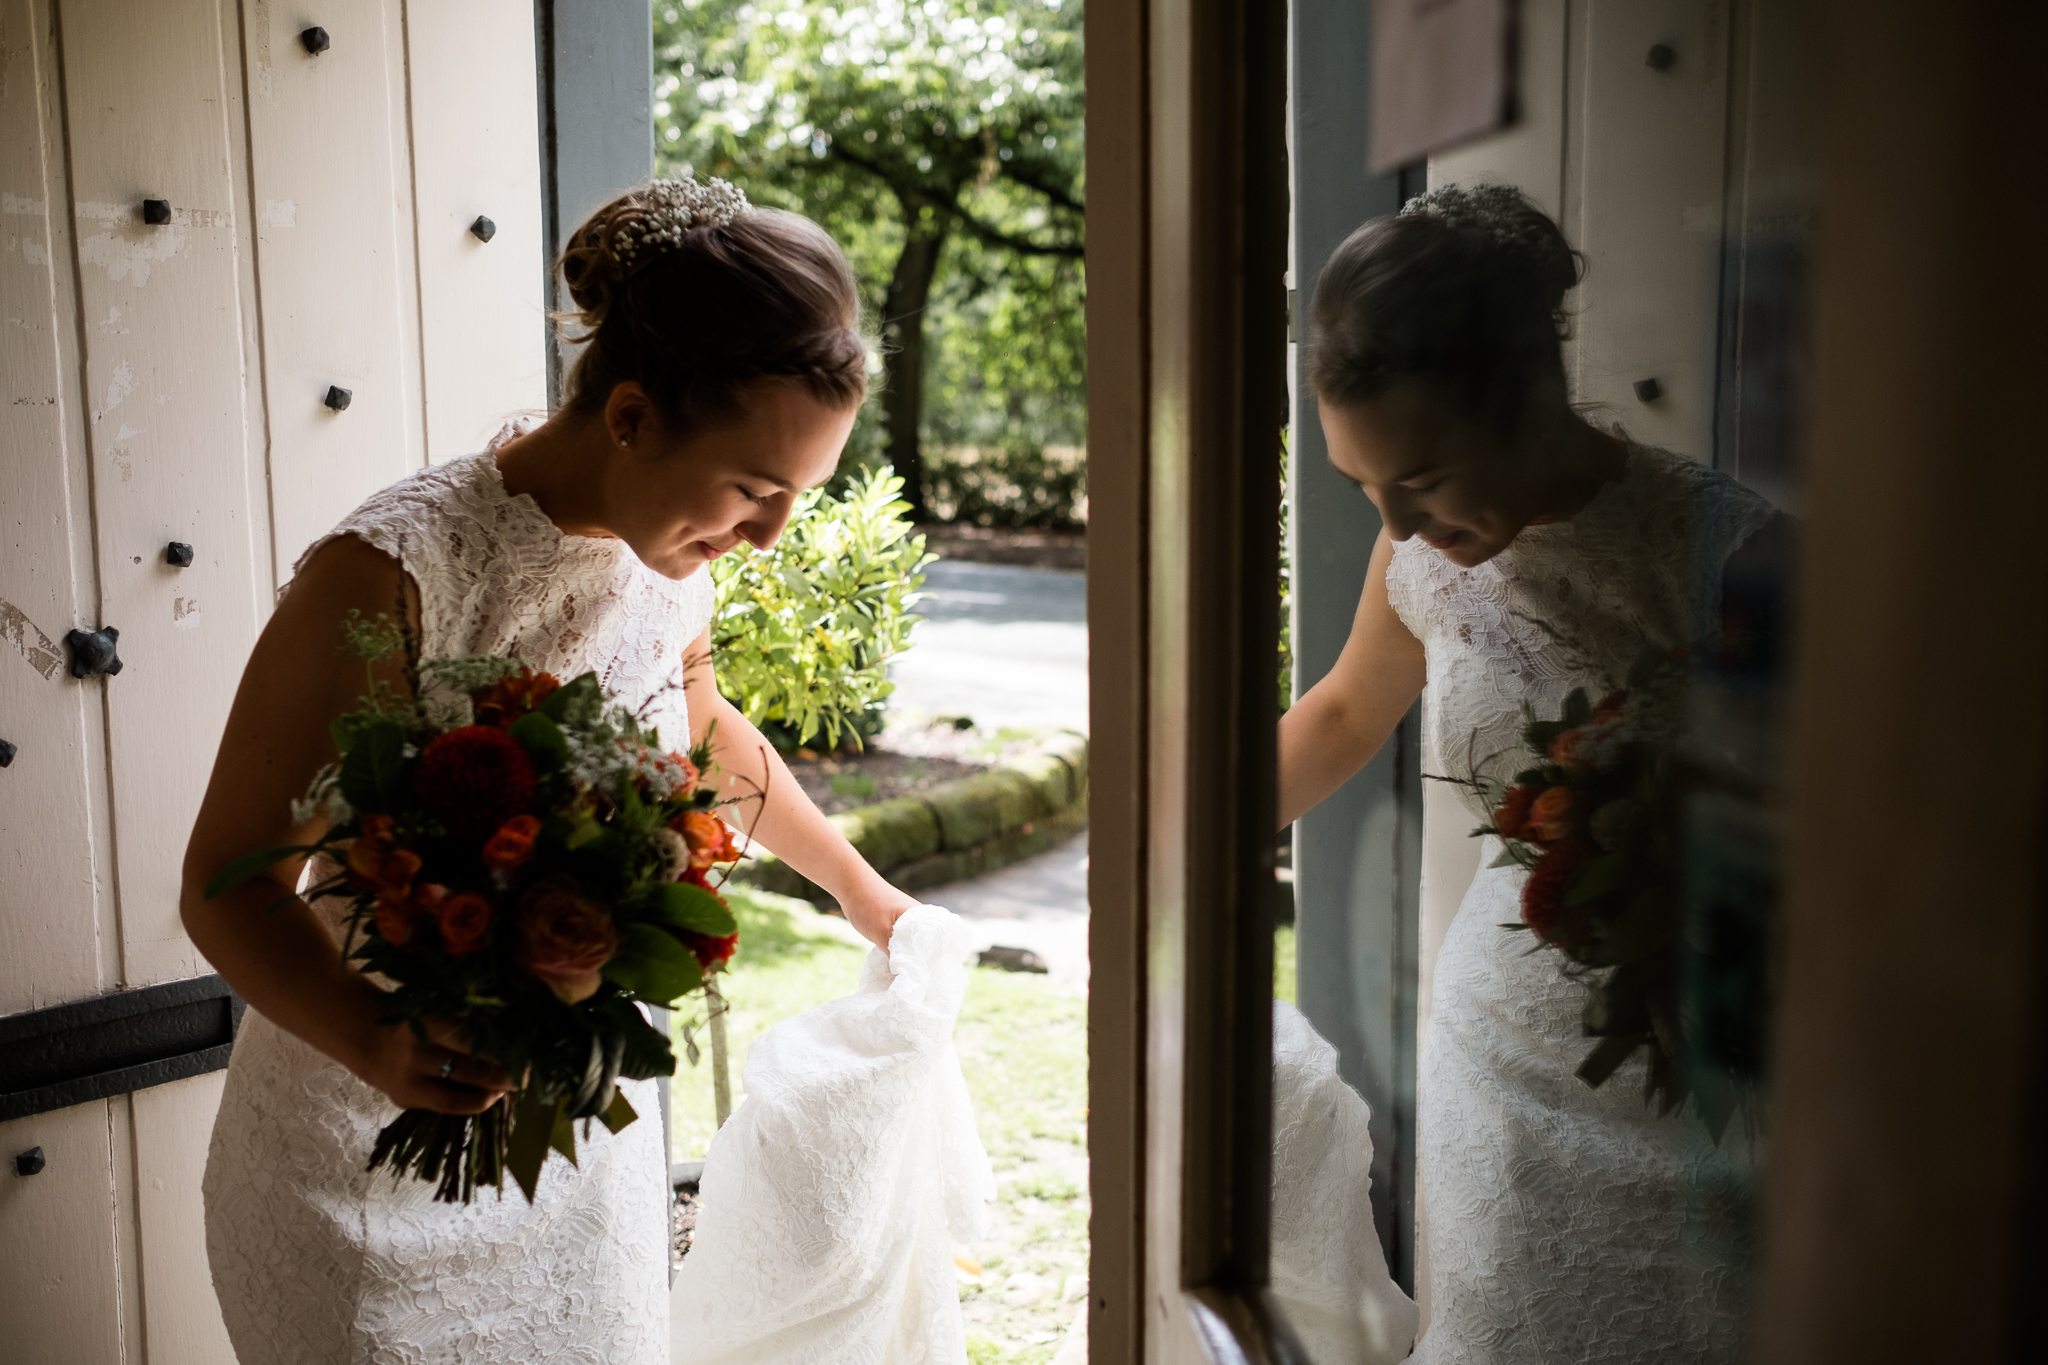 Relaxed Documentary Wedding Photography at The Wizard Inn, Alderley Edge Cheshire - Jenny Harper-15.jpg